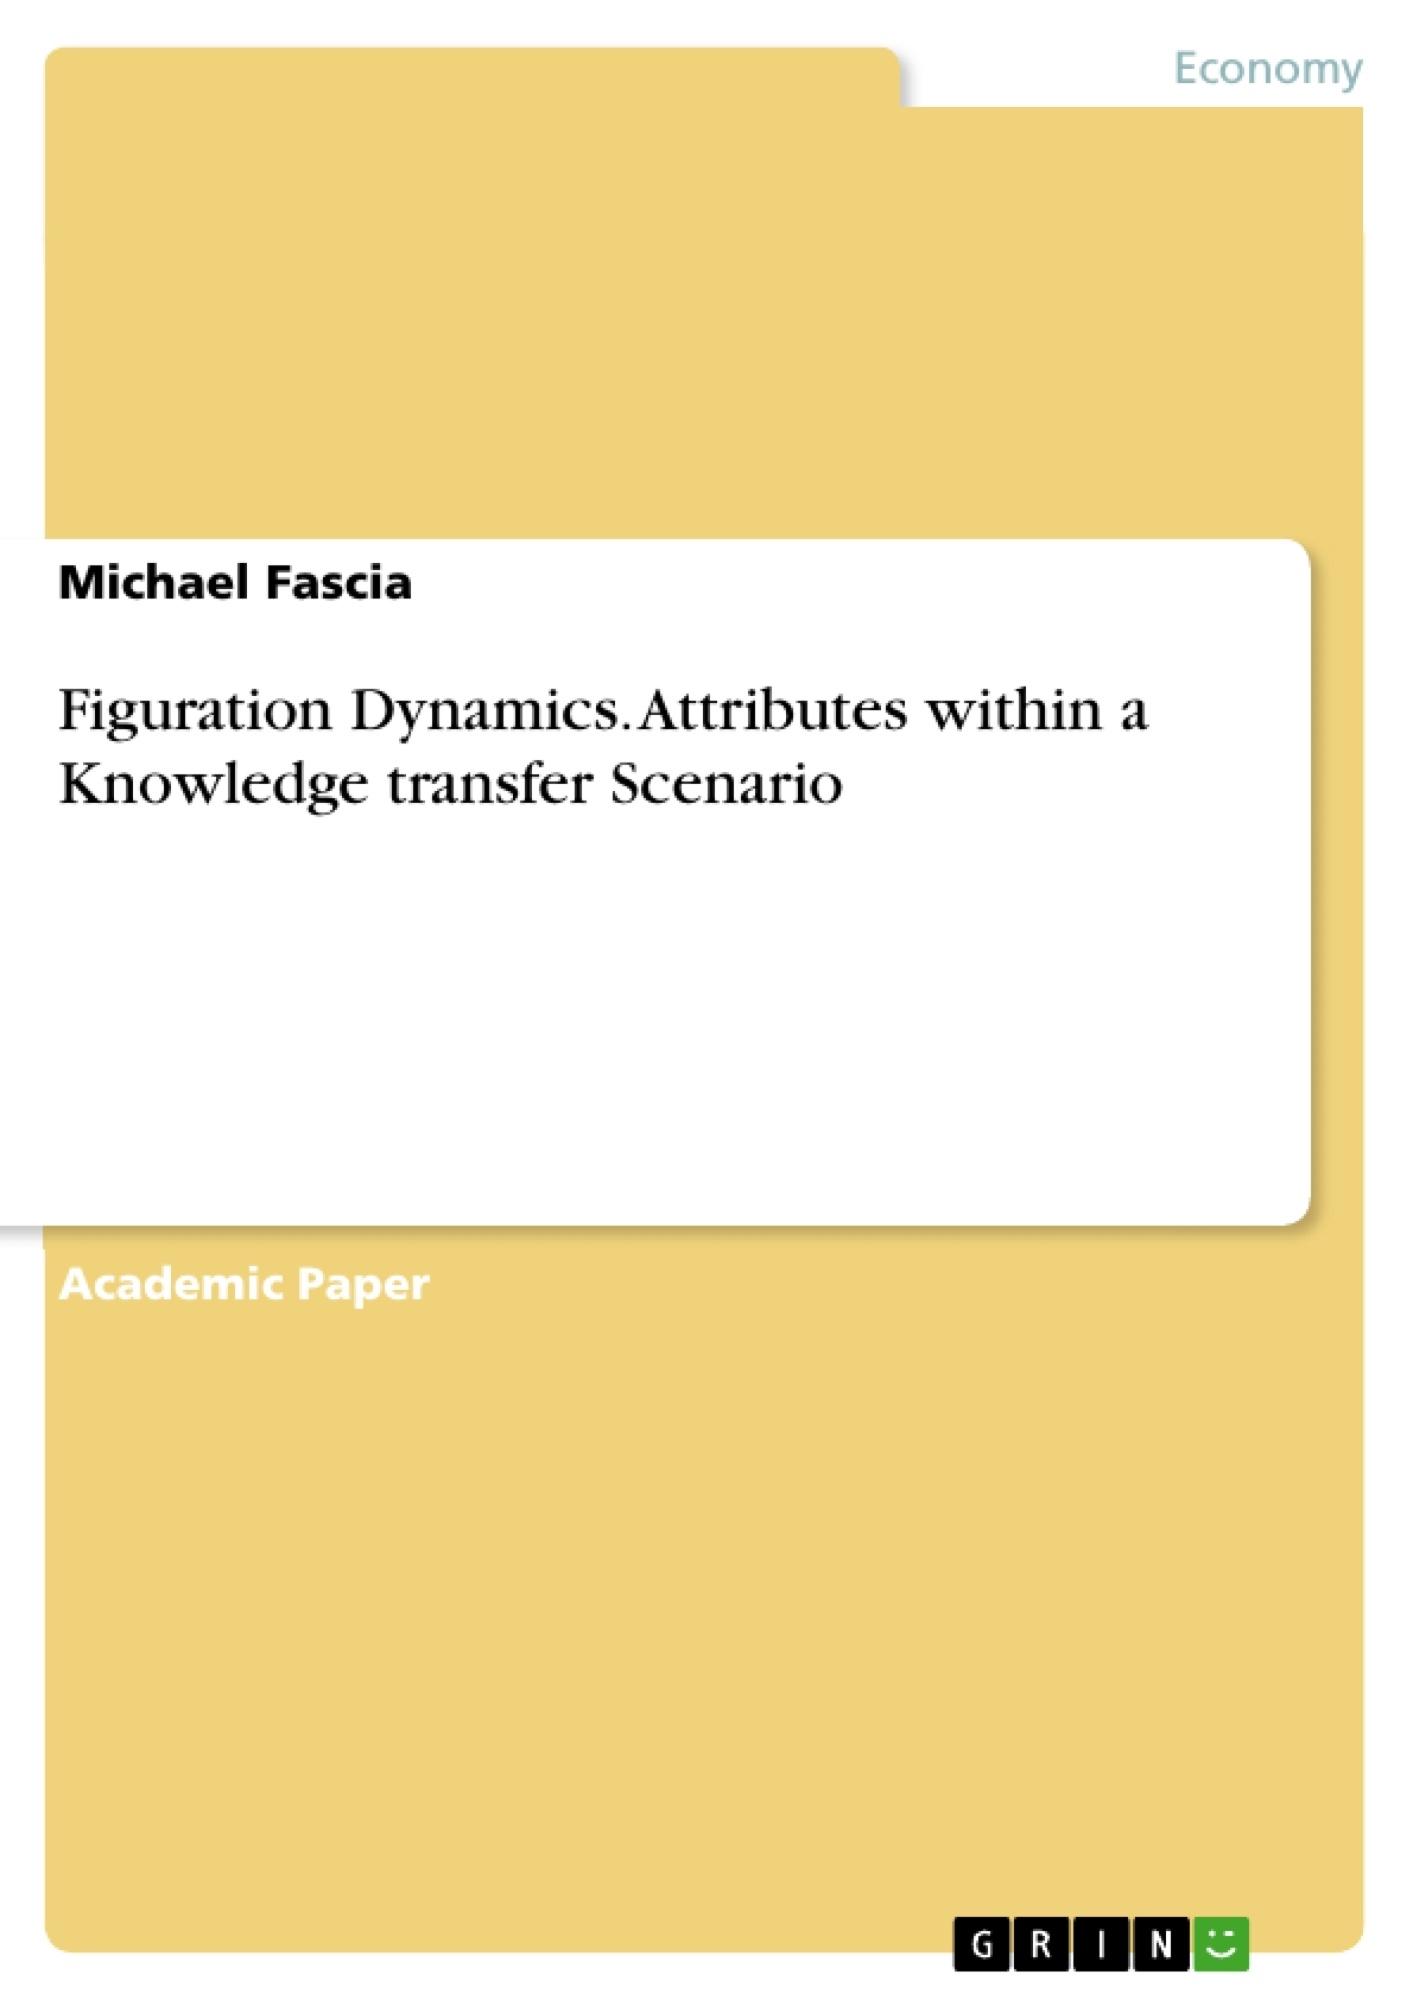 Title: Figuration Dynamics. Attributes within a Knowledge transfer Scenario